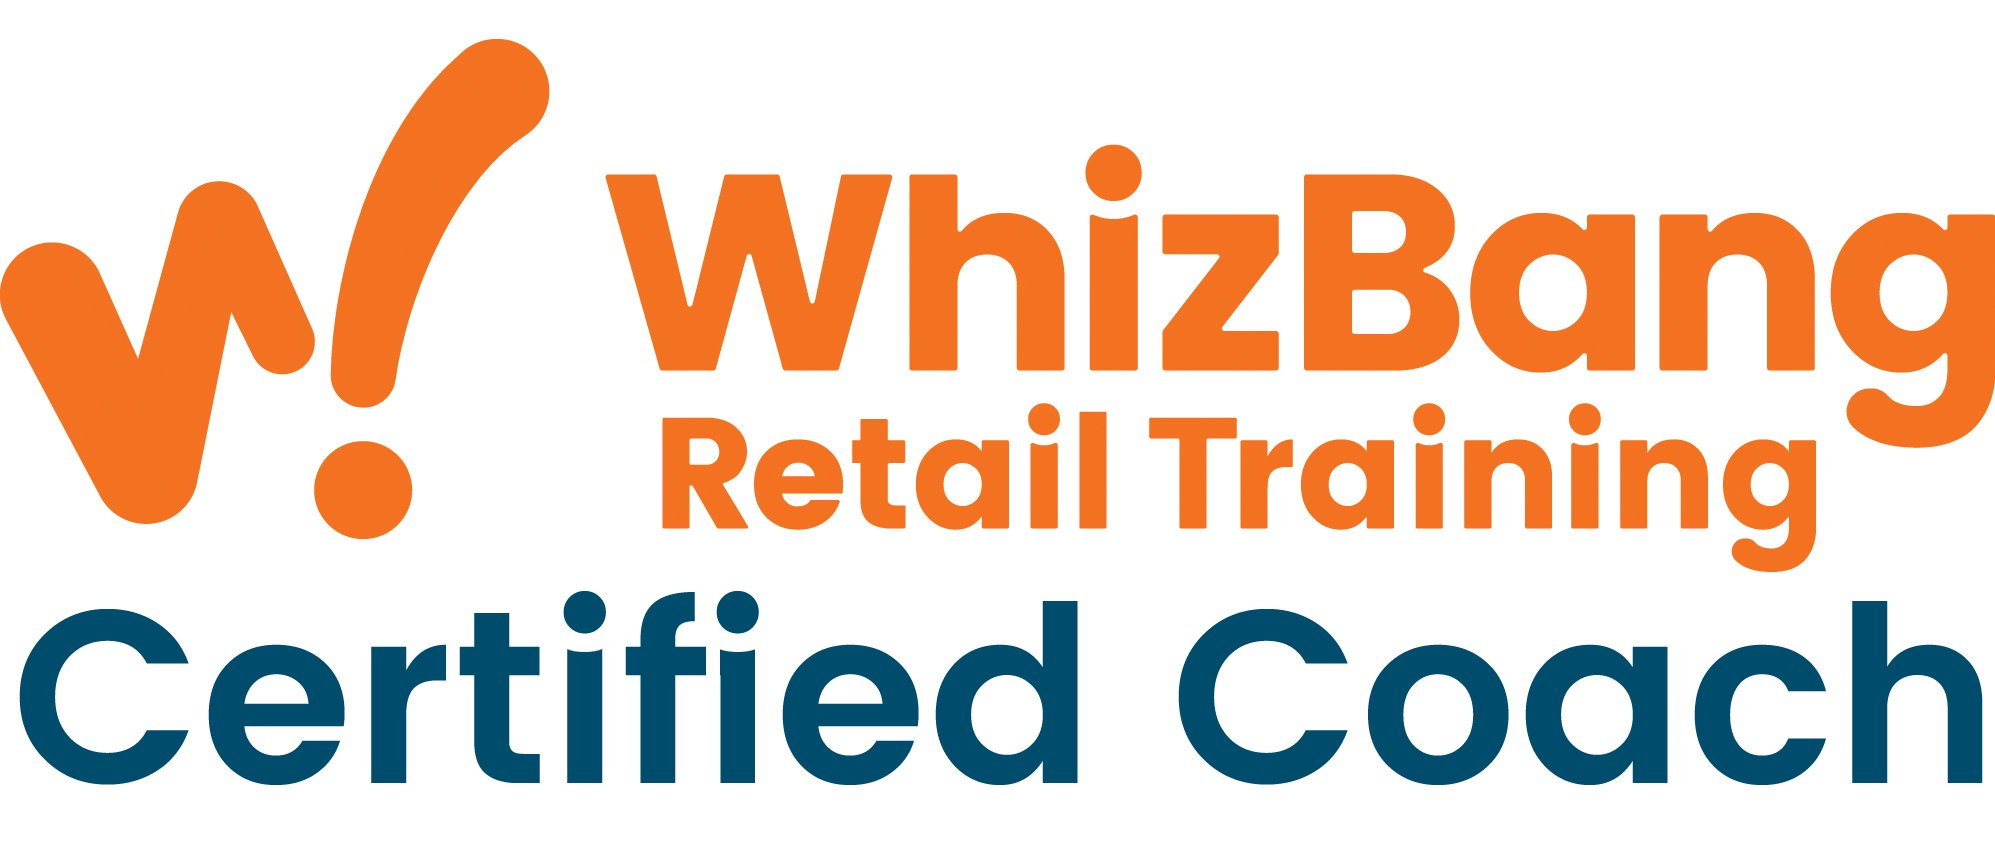 Whizbang Retail Training Certified Coach